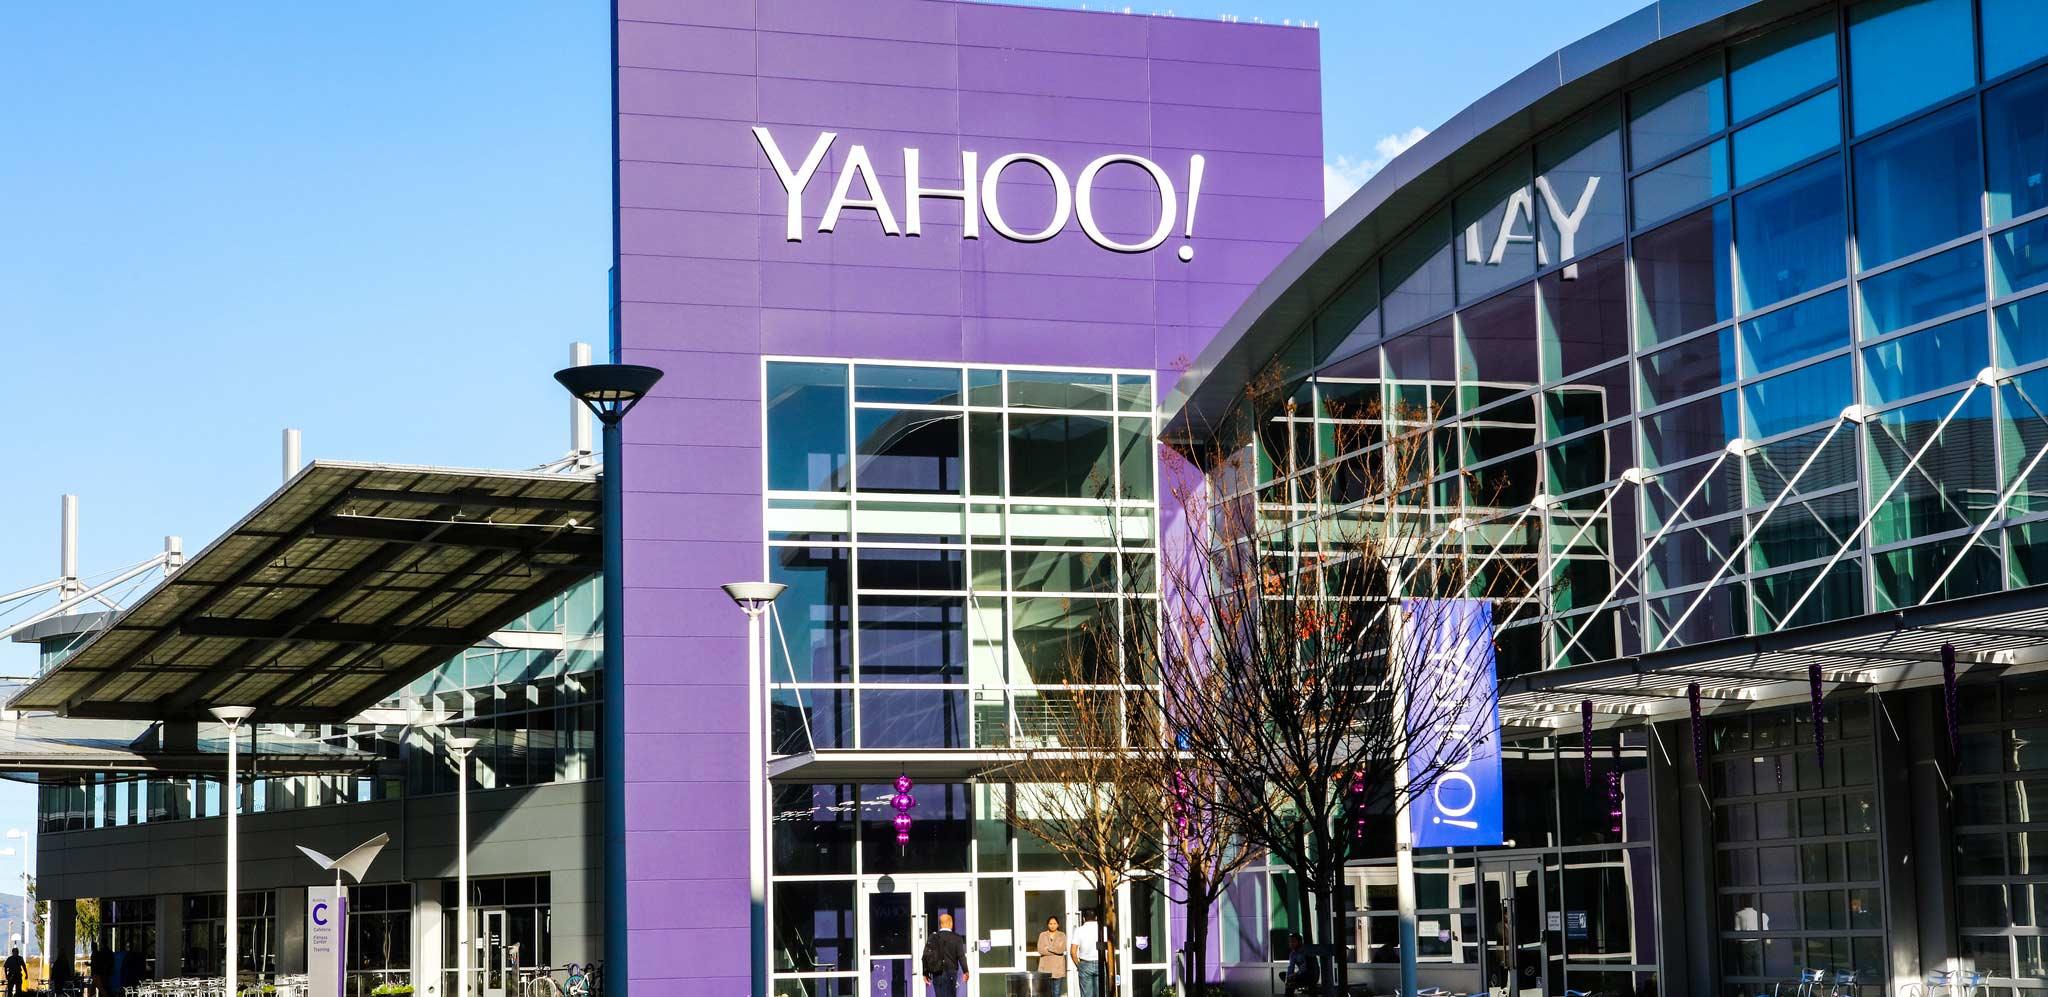 Photo of Yahoo's office - yahoo data breach